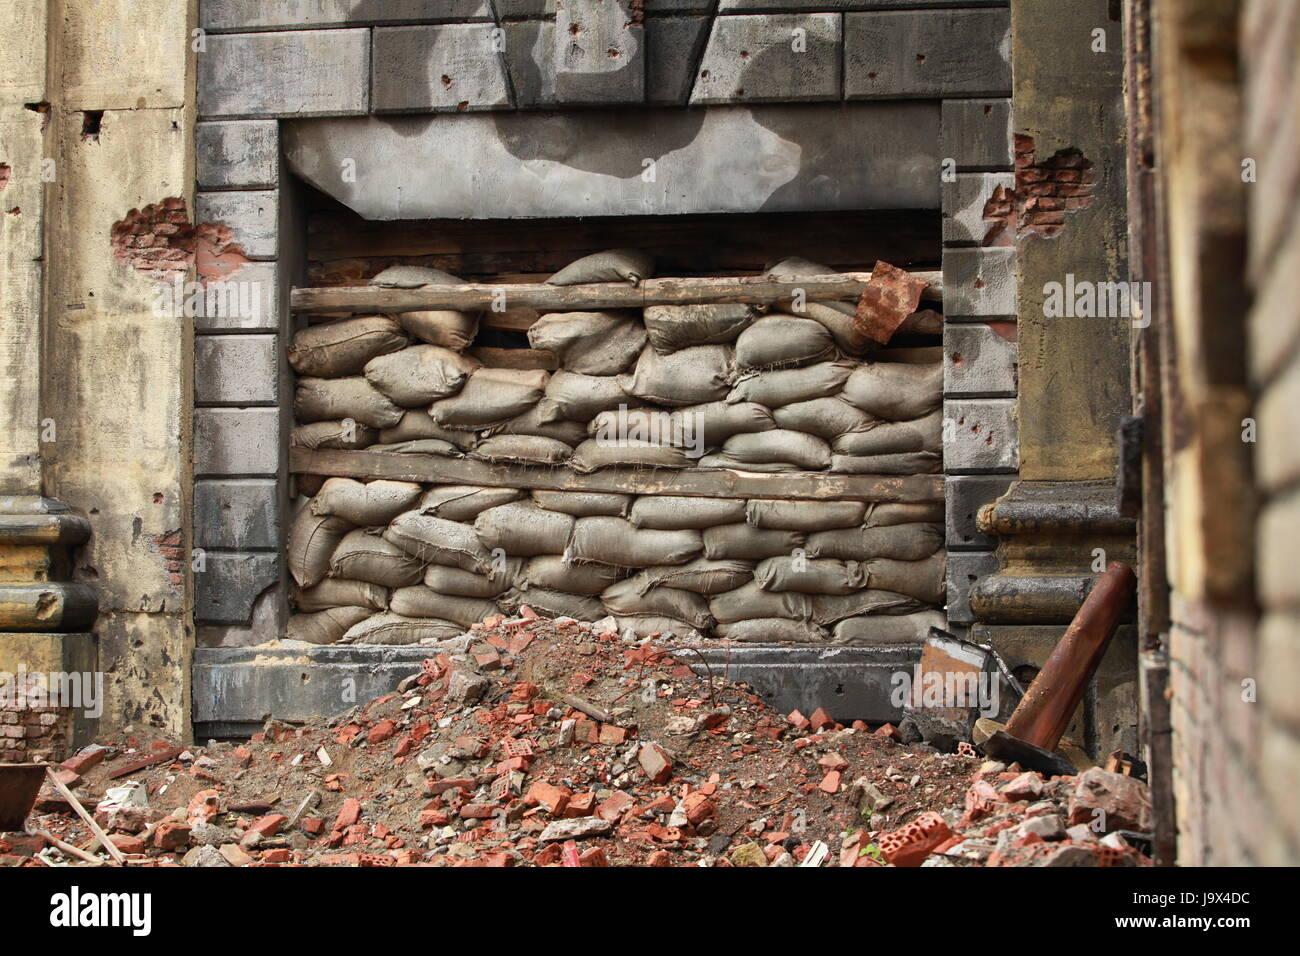 War barricade of bags per the window - Stock Image